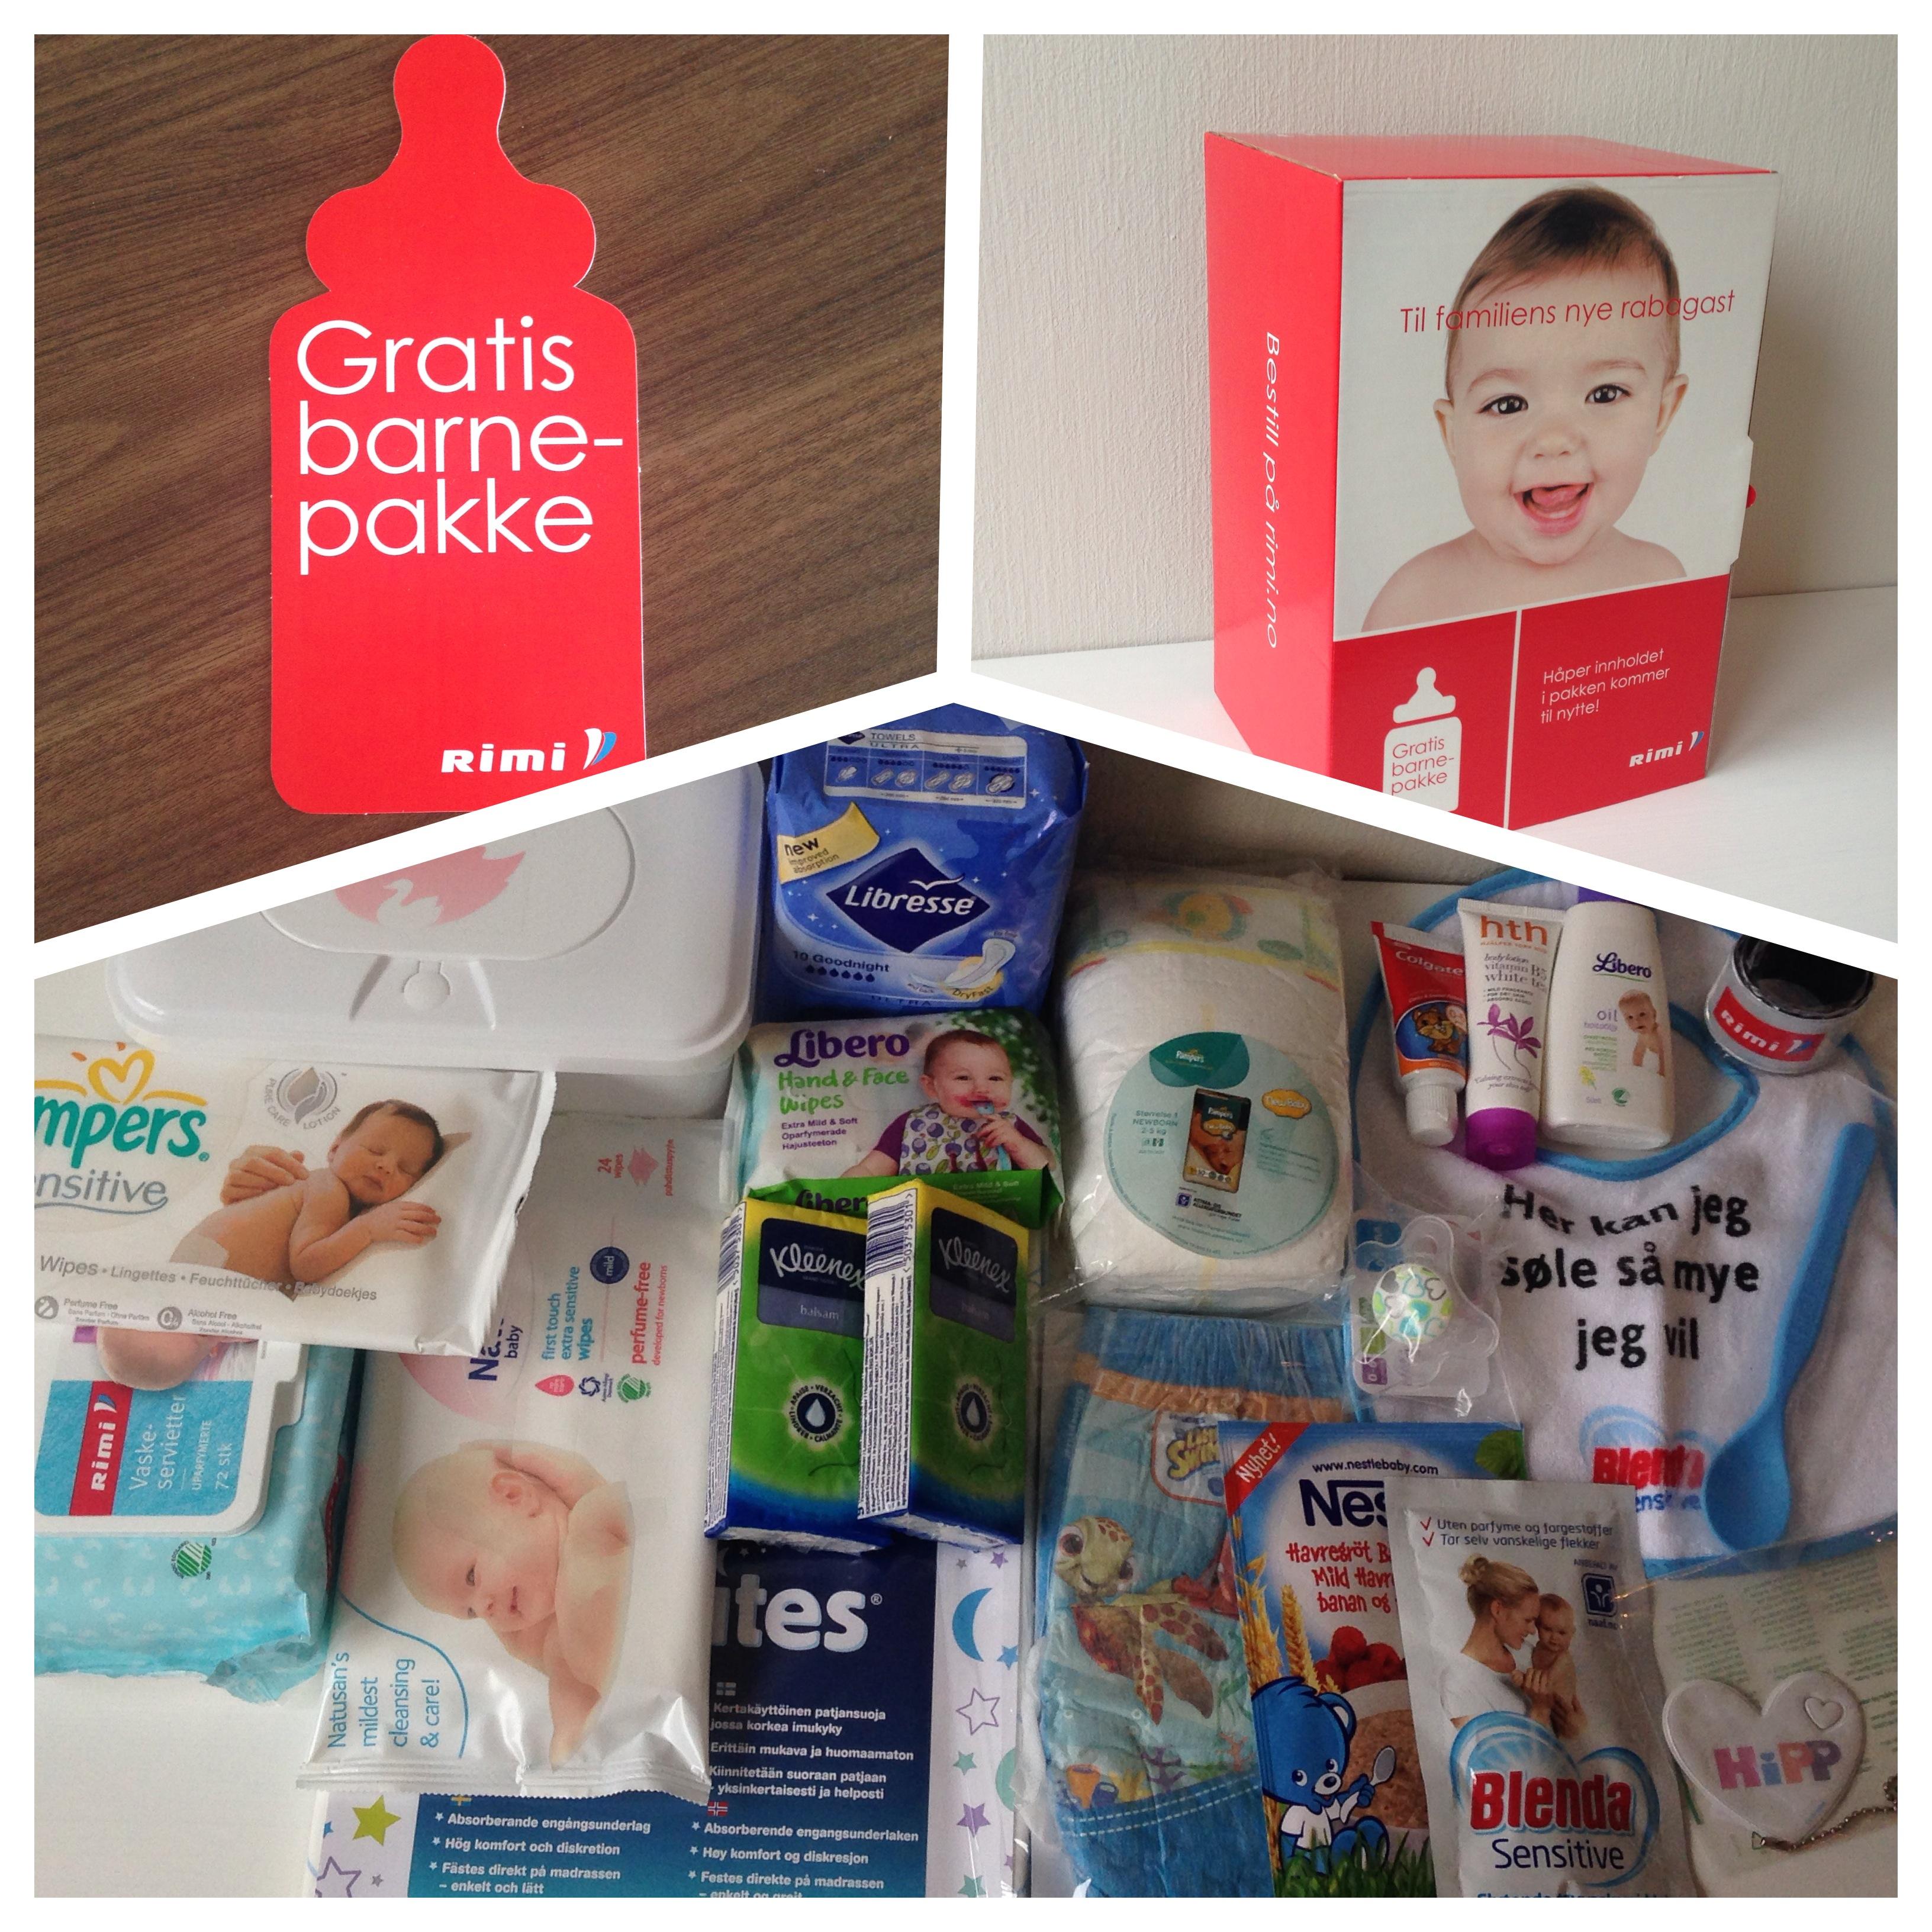 Gratis barnepakke fra Rimi